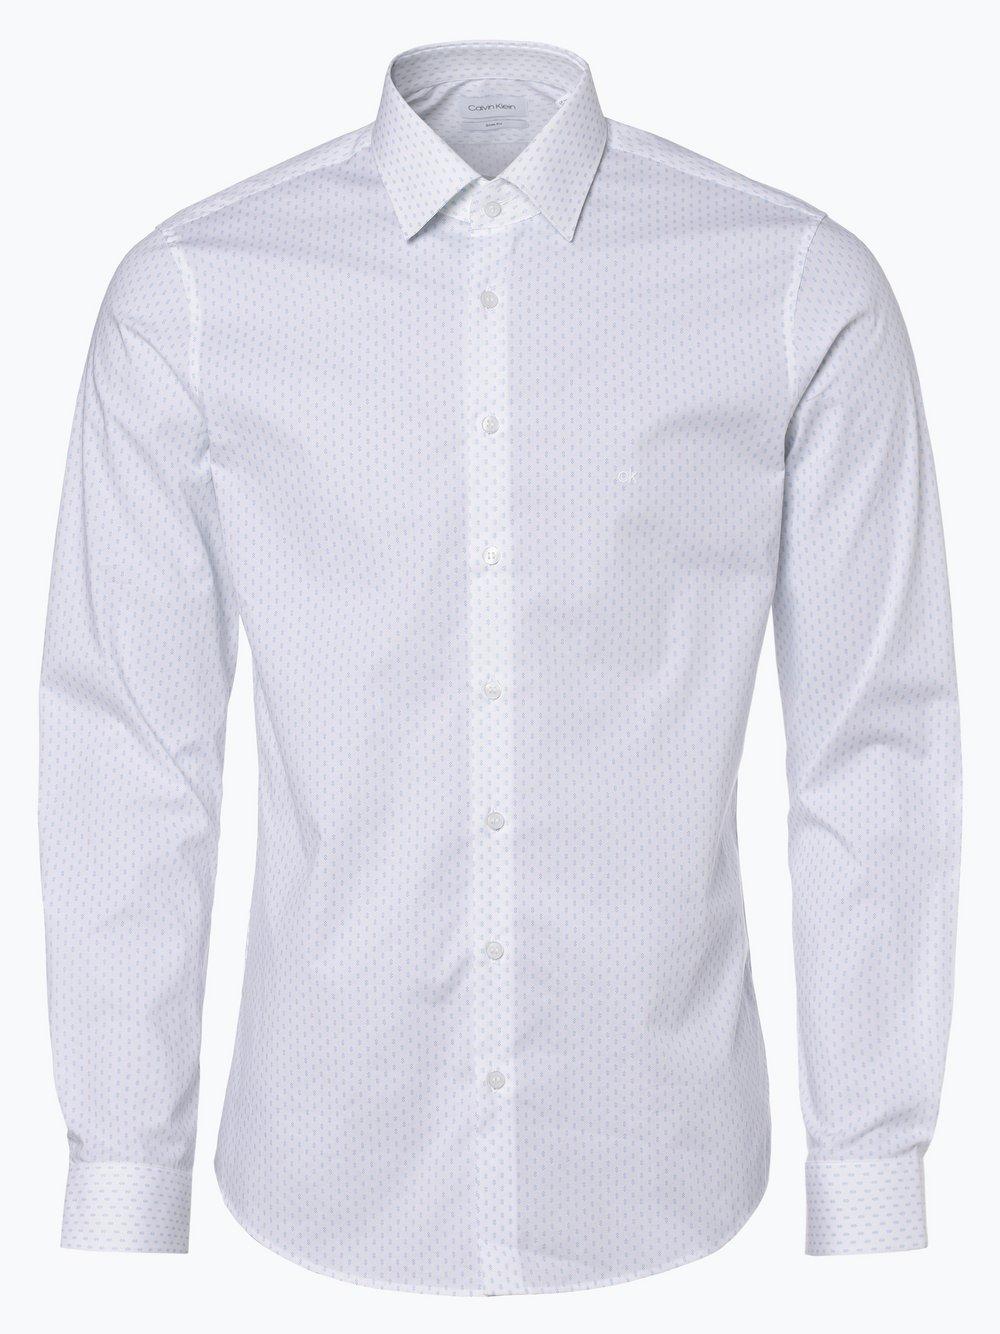 8d41b3737 Calvin Klein Koszula męska kup online   VANGRAAF.COM